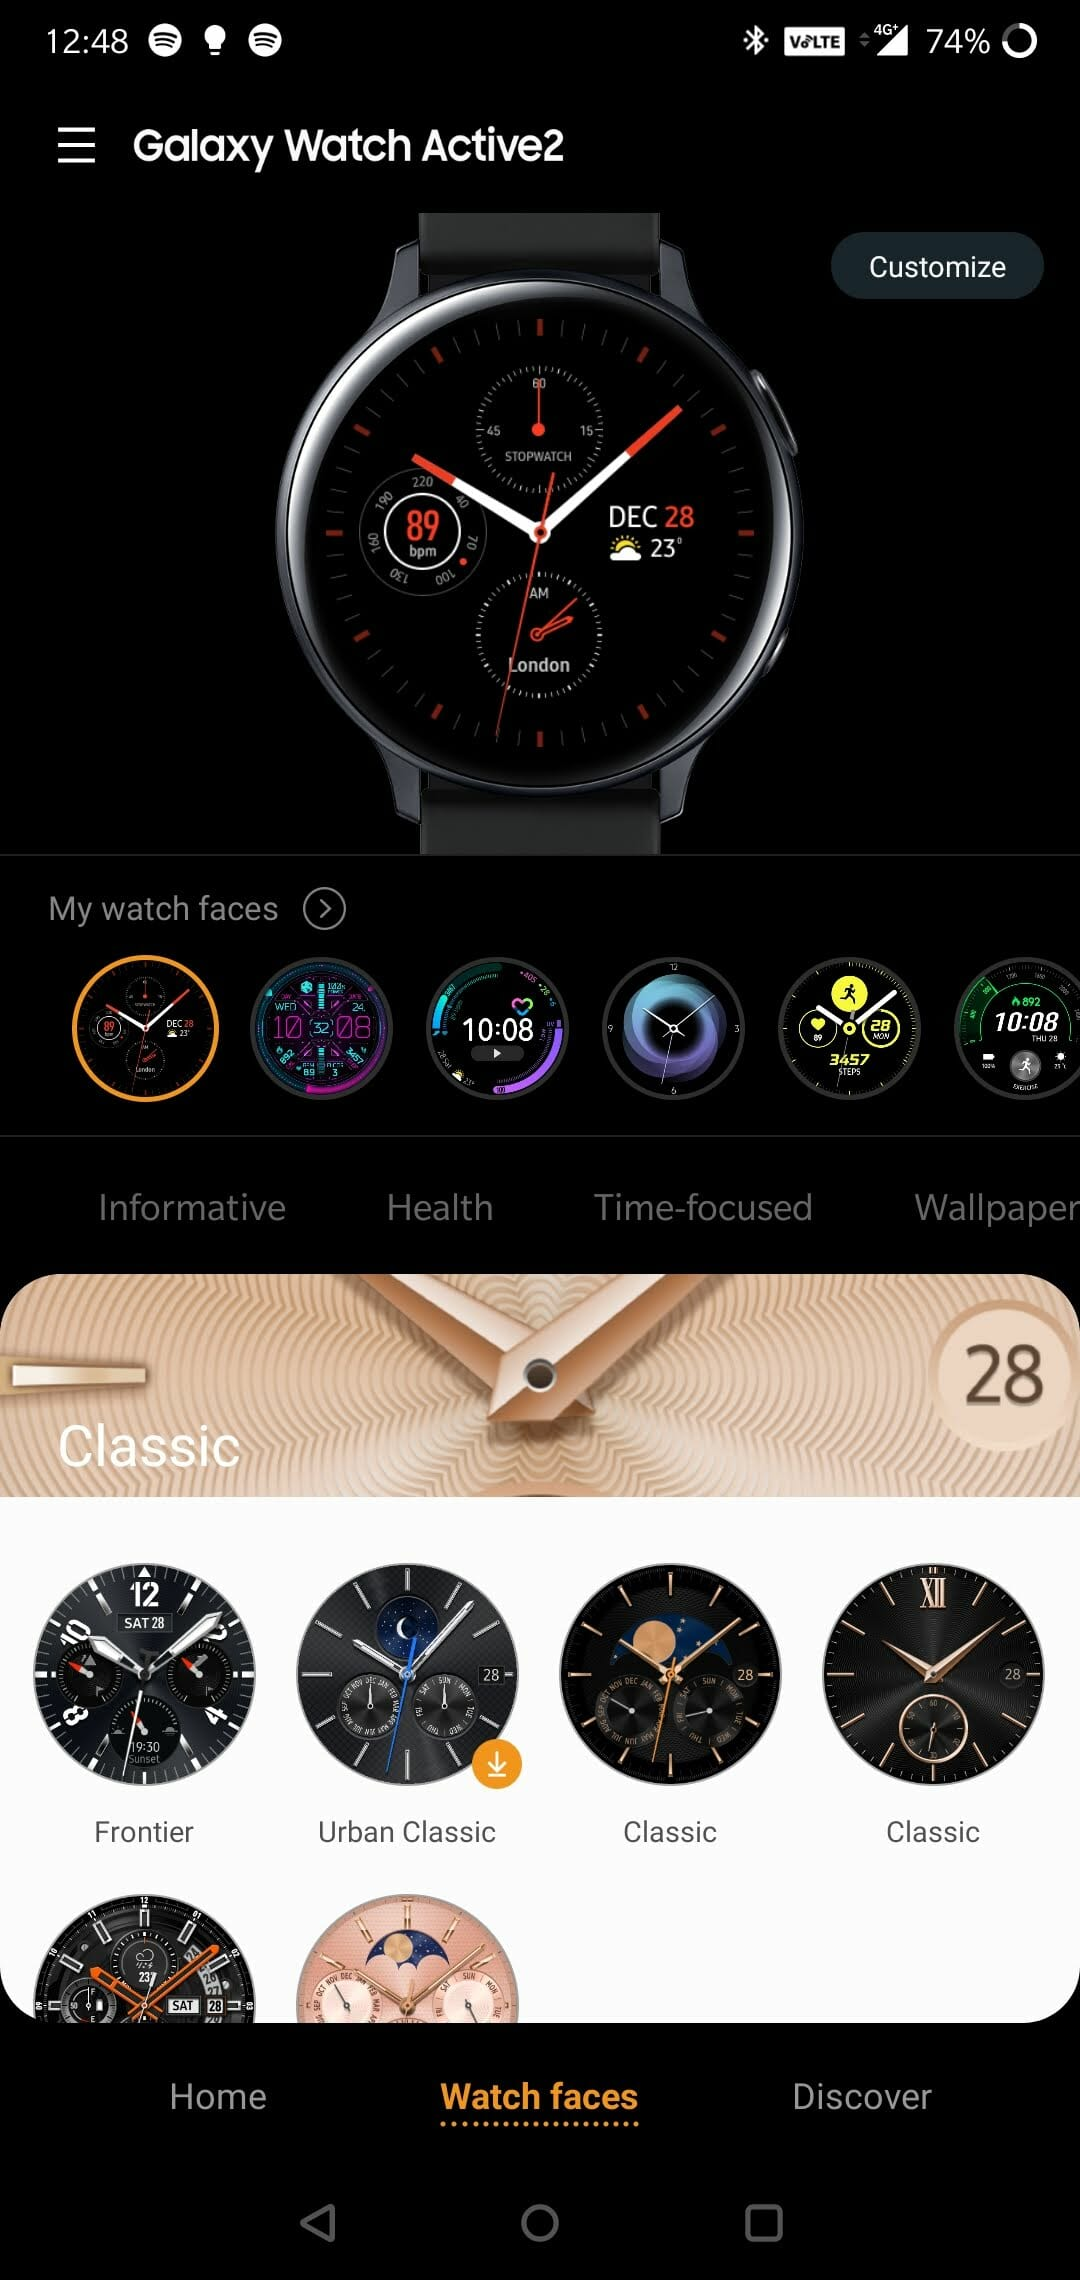 watchface-puhelin-kayttoliittyma-ulkoasu-galaxy-watch-active-2